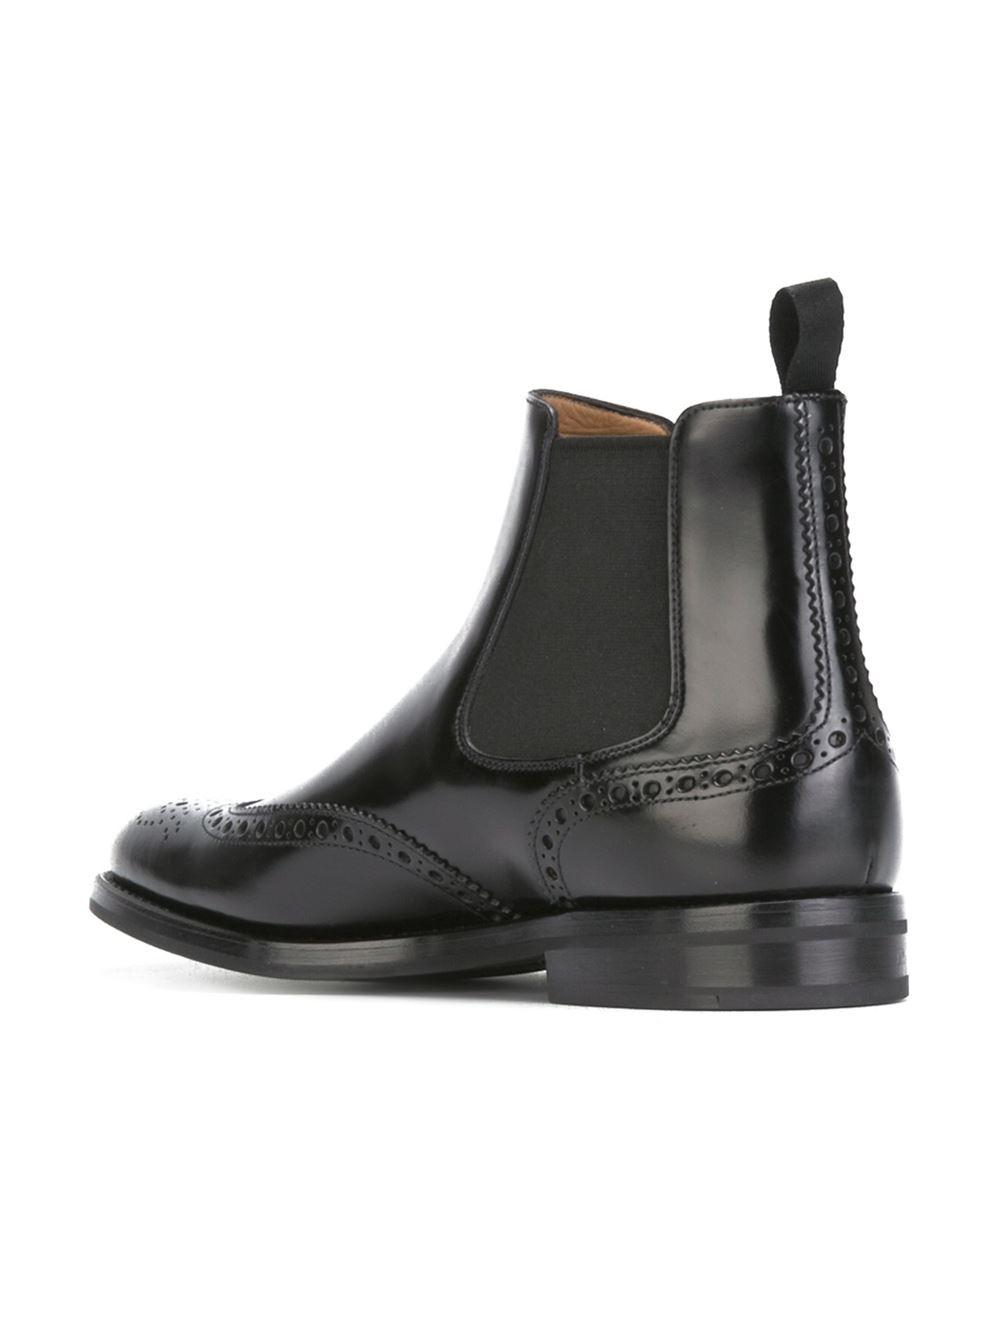 Beautiful Dune Womenu0026#39;s Quentin Leather Mix Brogue Chelsea Boots - Black Womens Footwear | TheHut.com